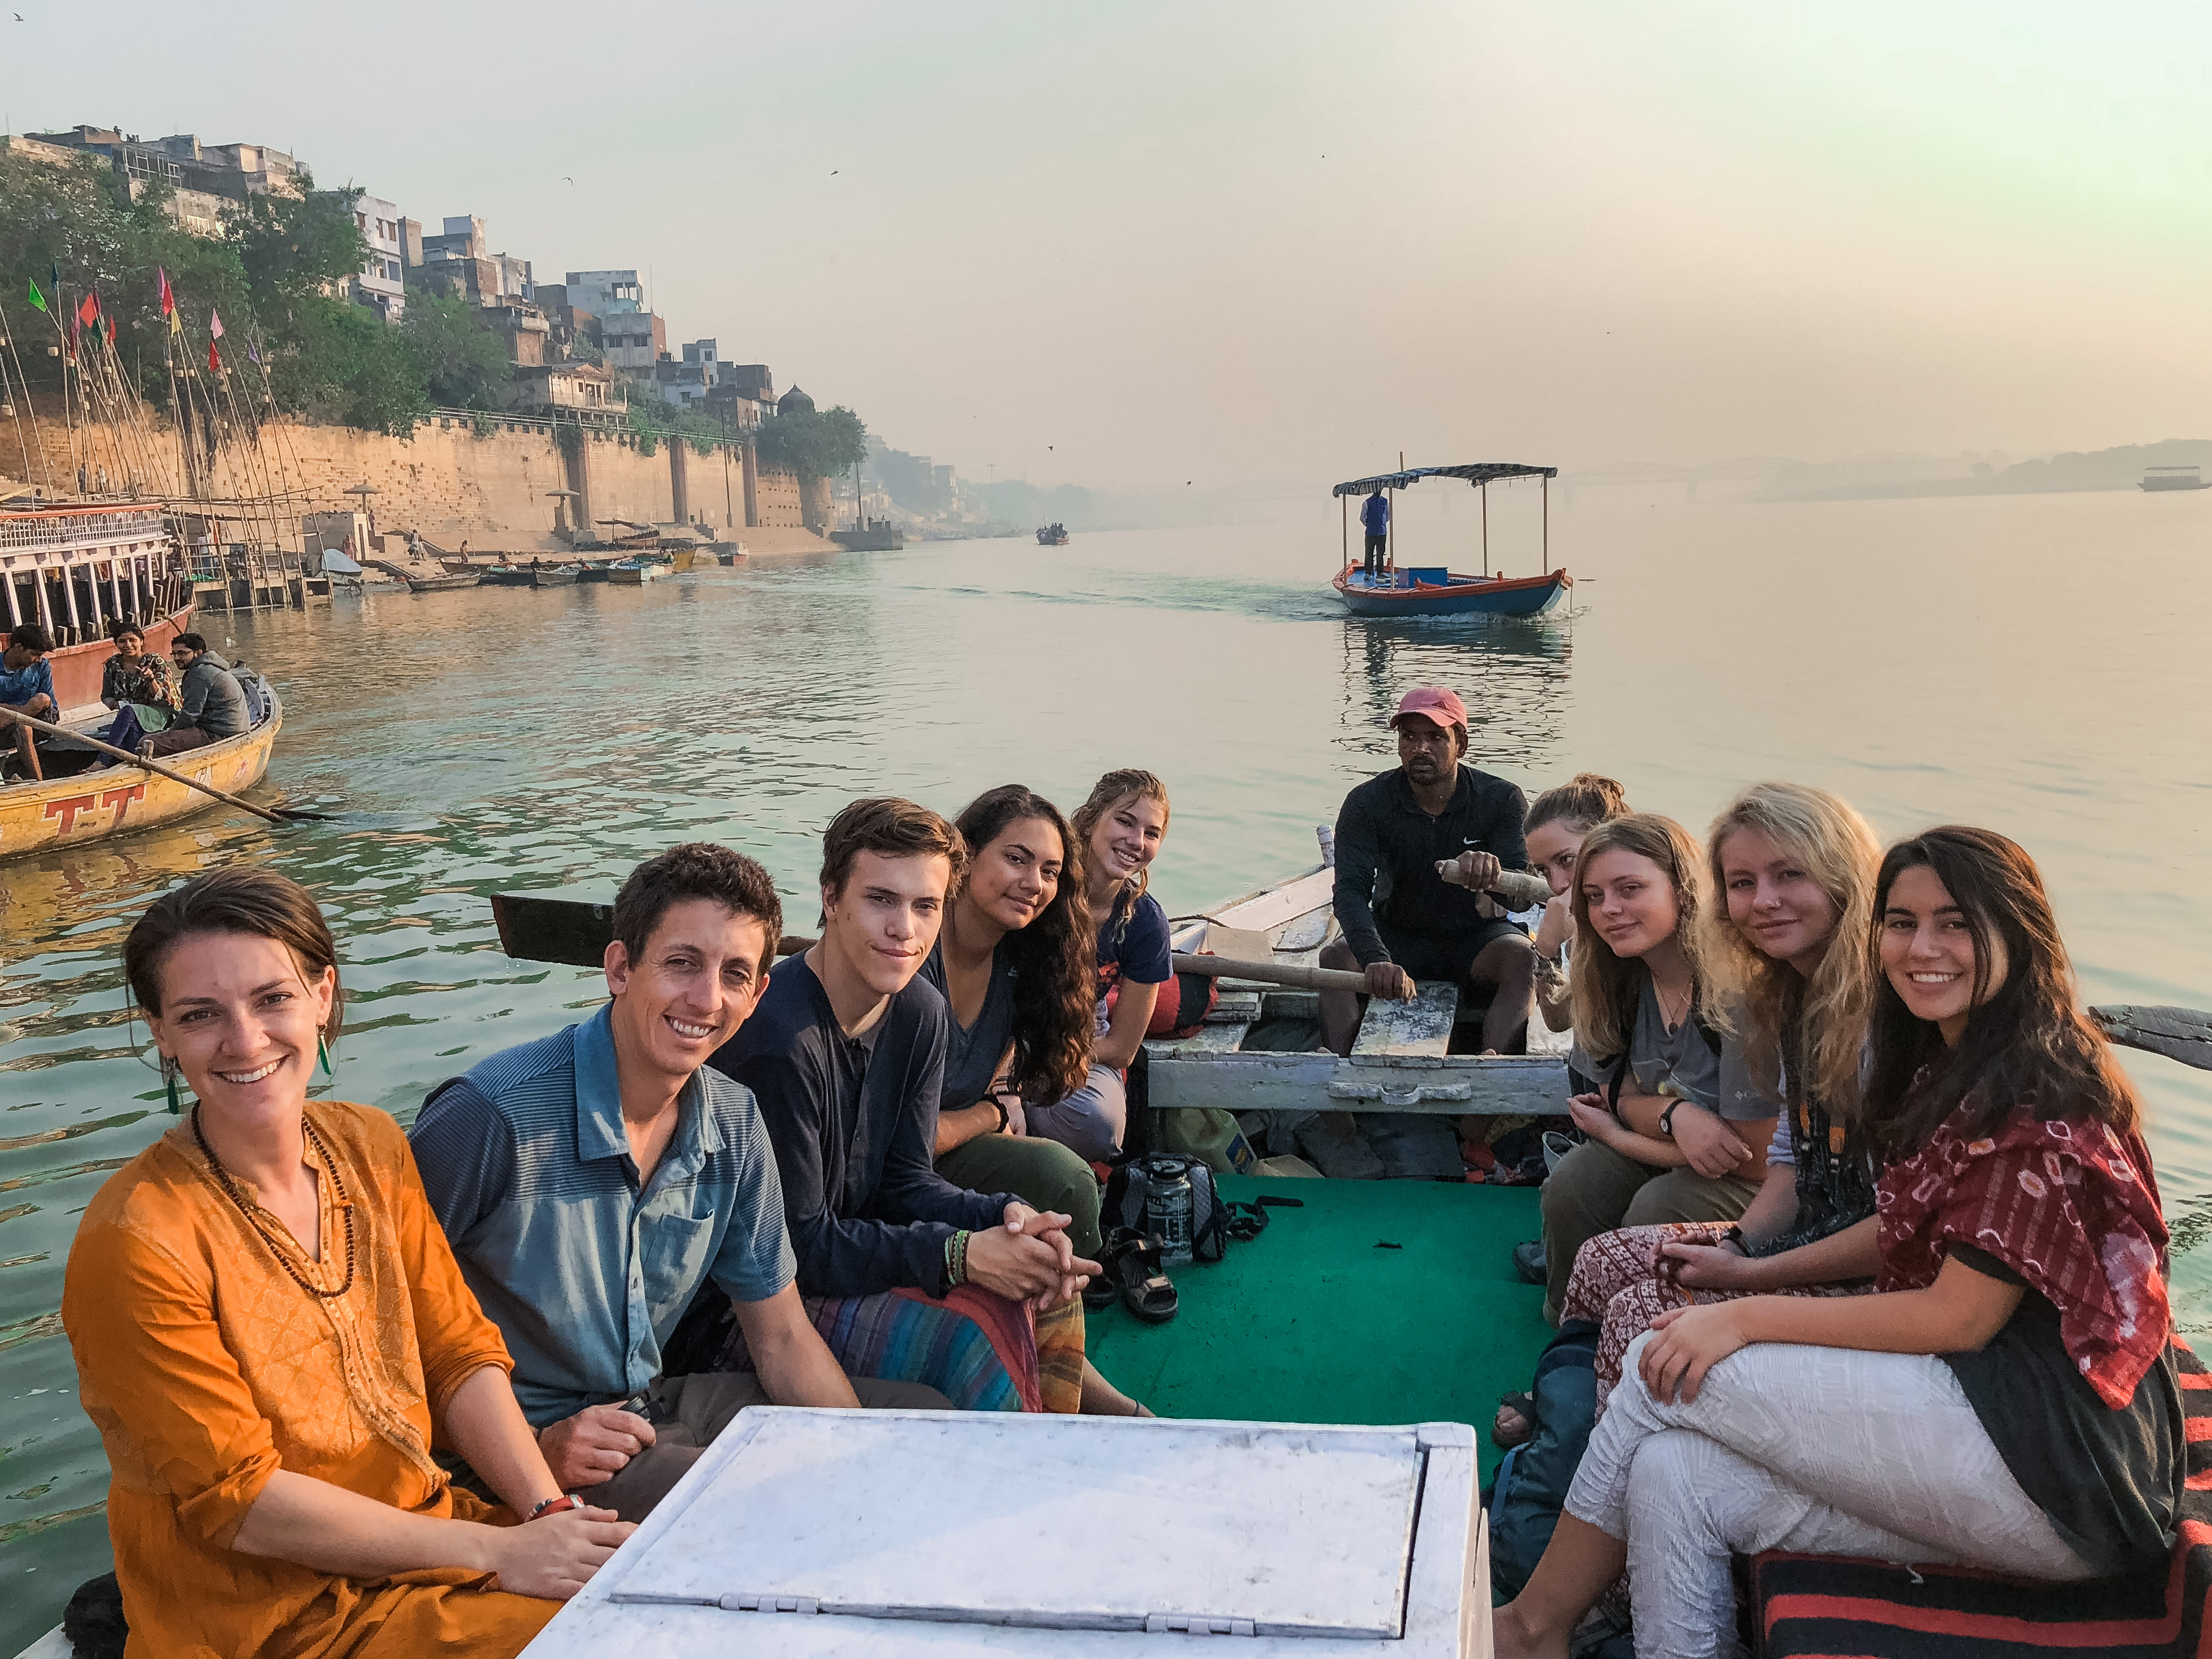 Gap Year Program - Carpe Diem Education | India Semester: Spirituality & Climate Change  4